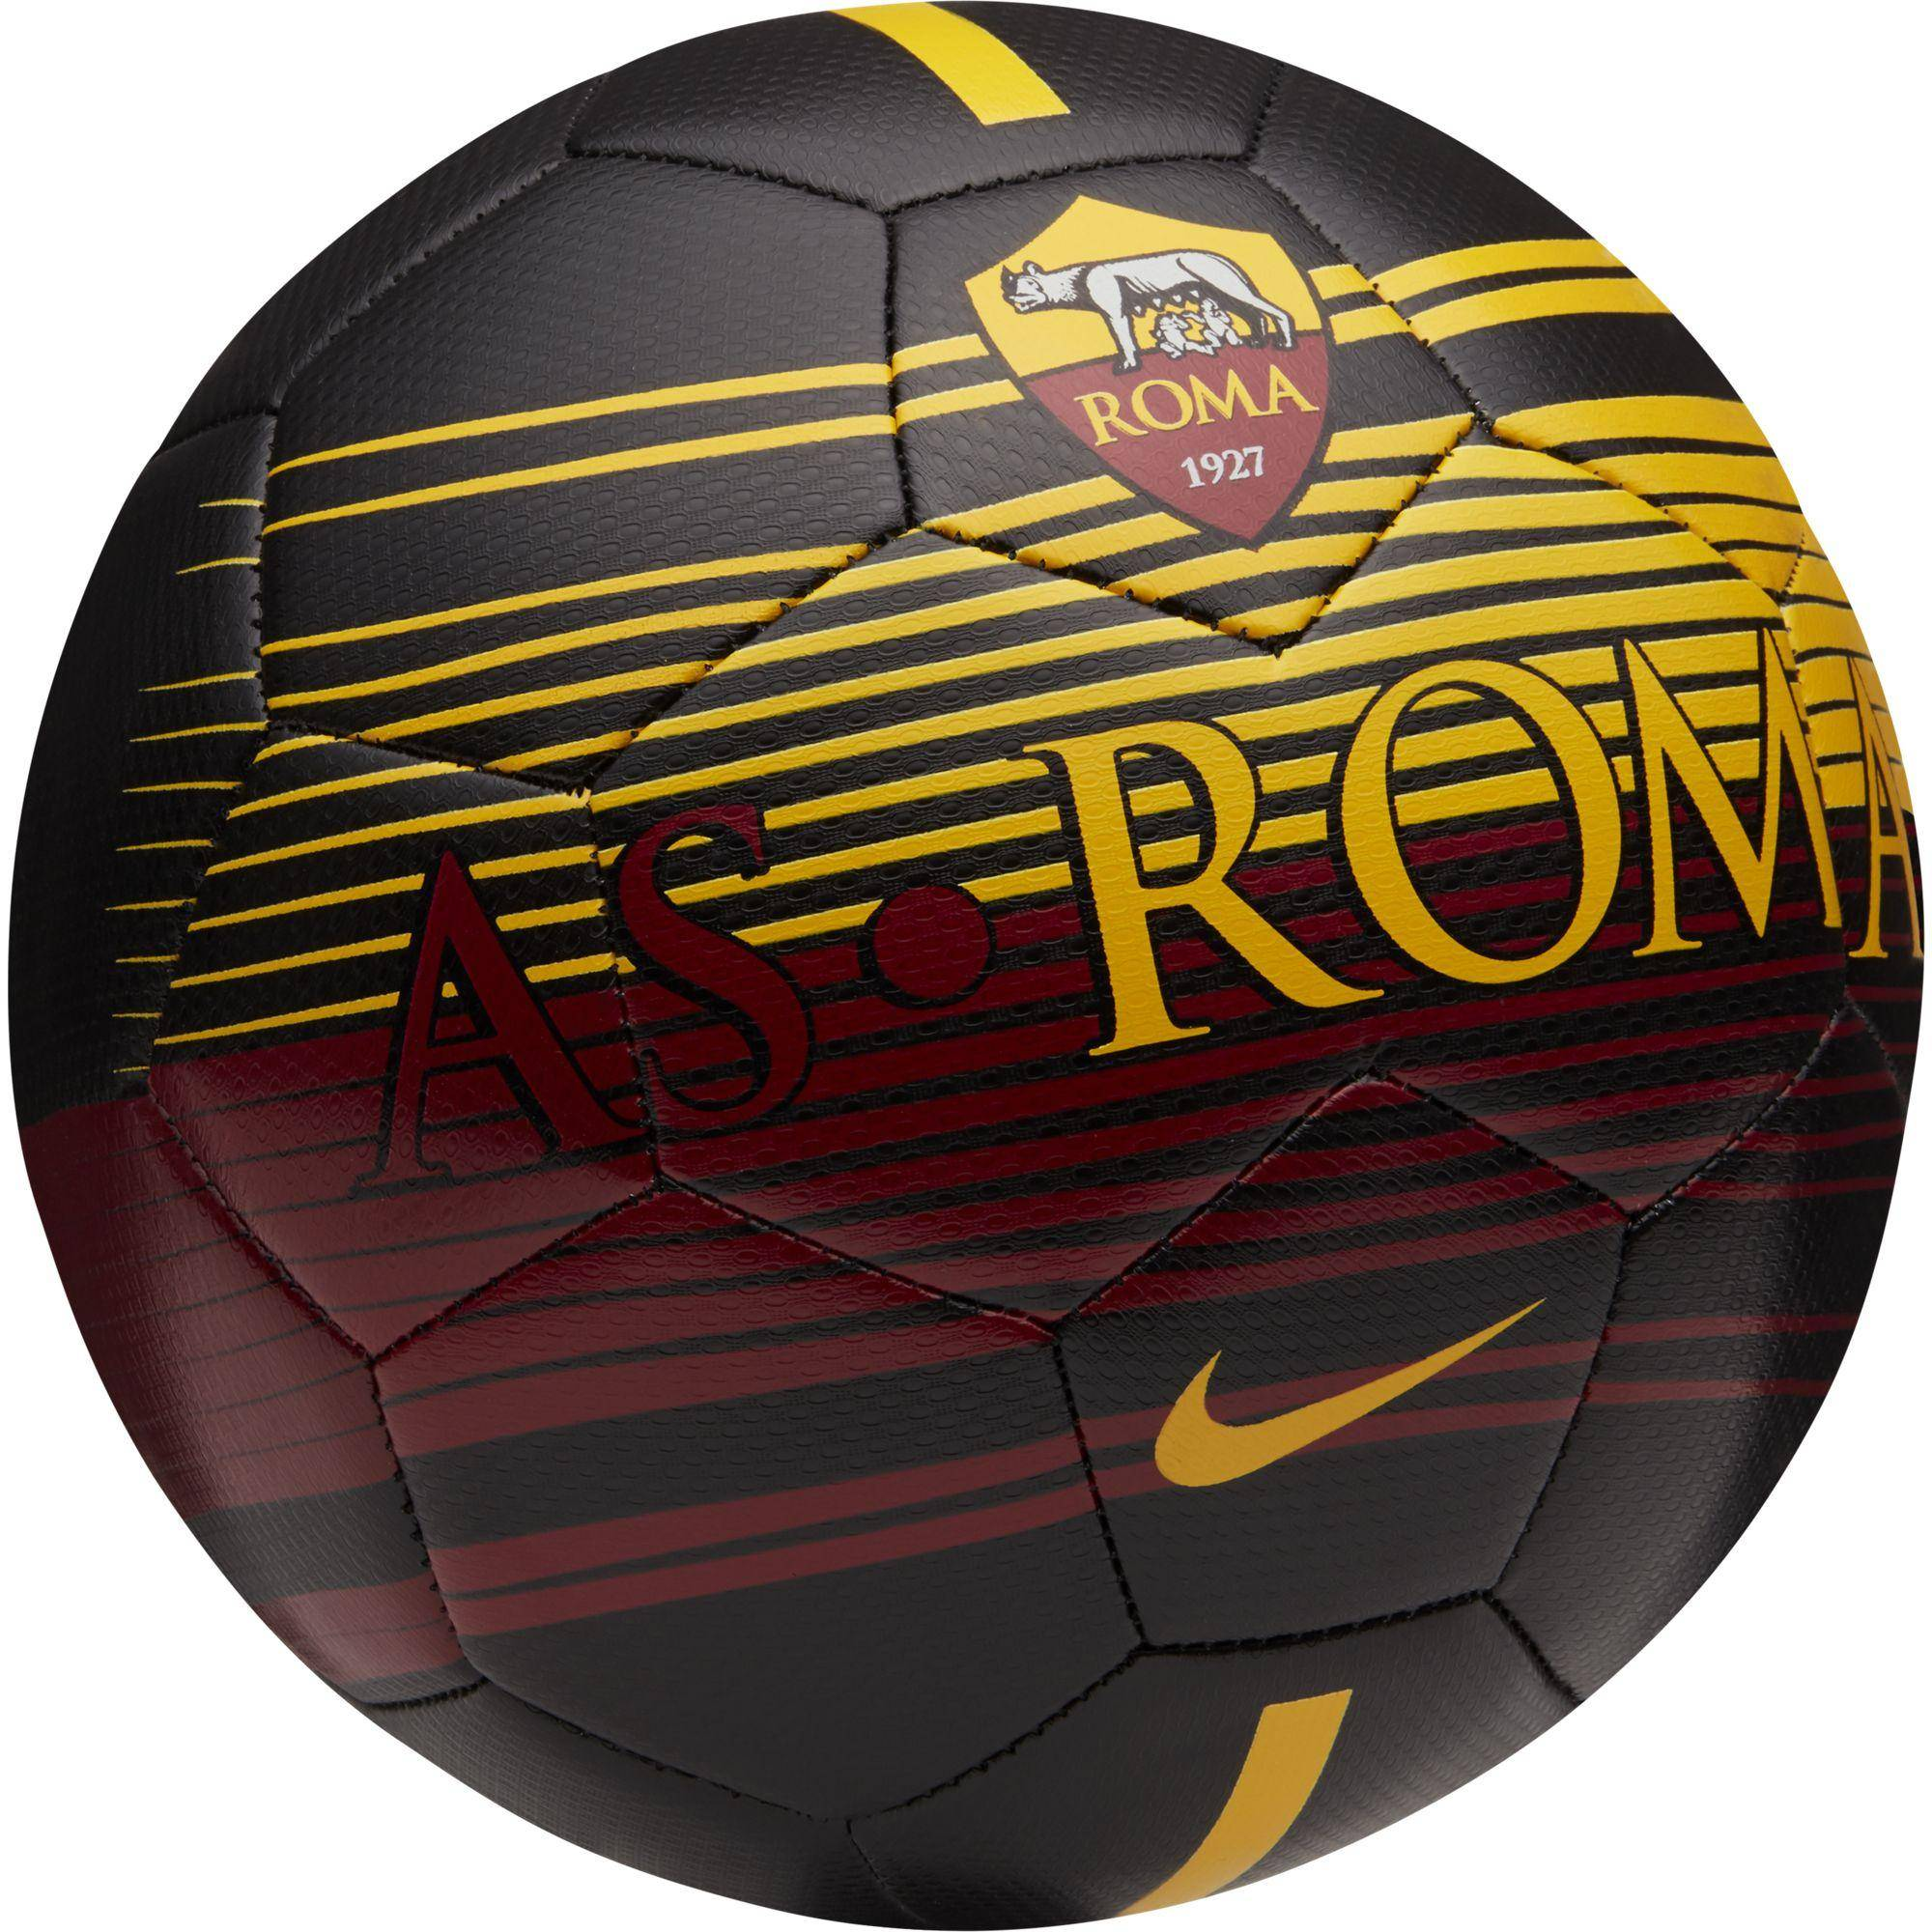 Nike PRESTIGE Nike Roma   18/19